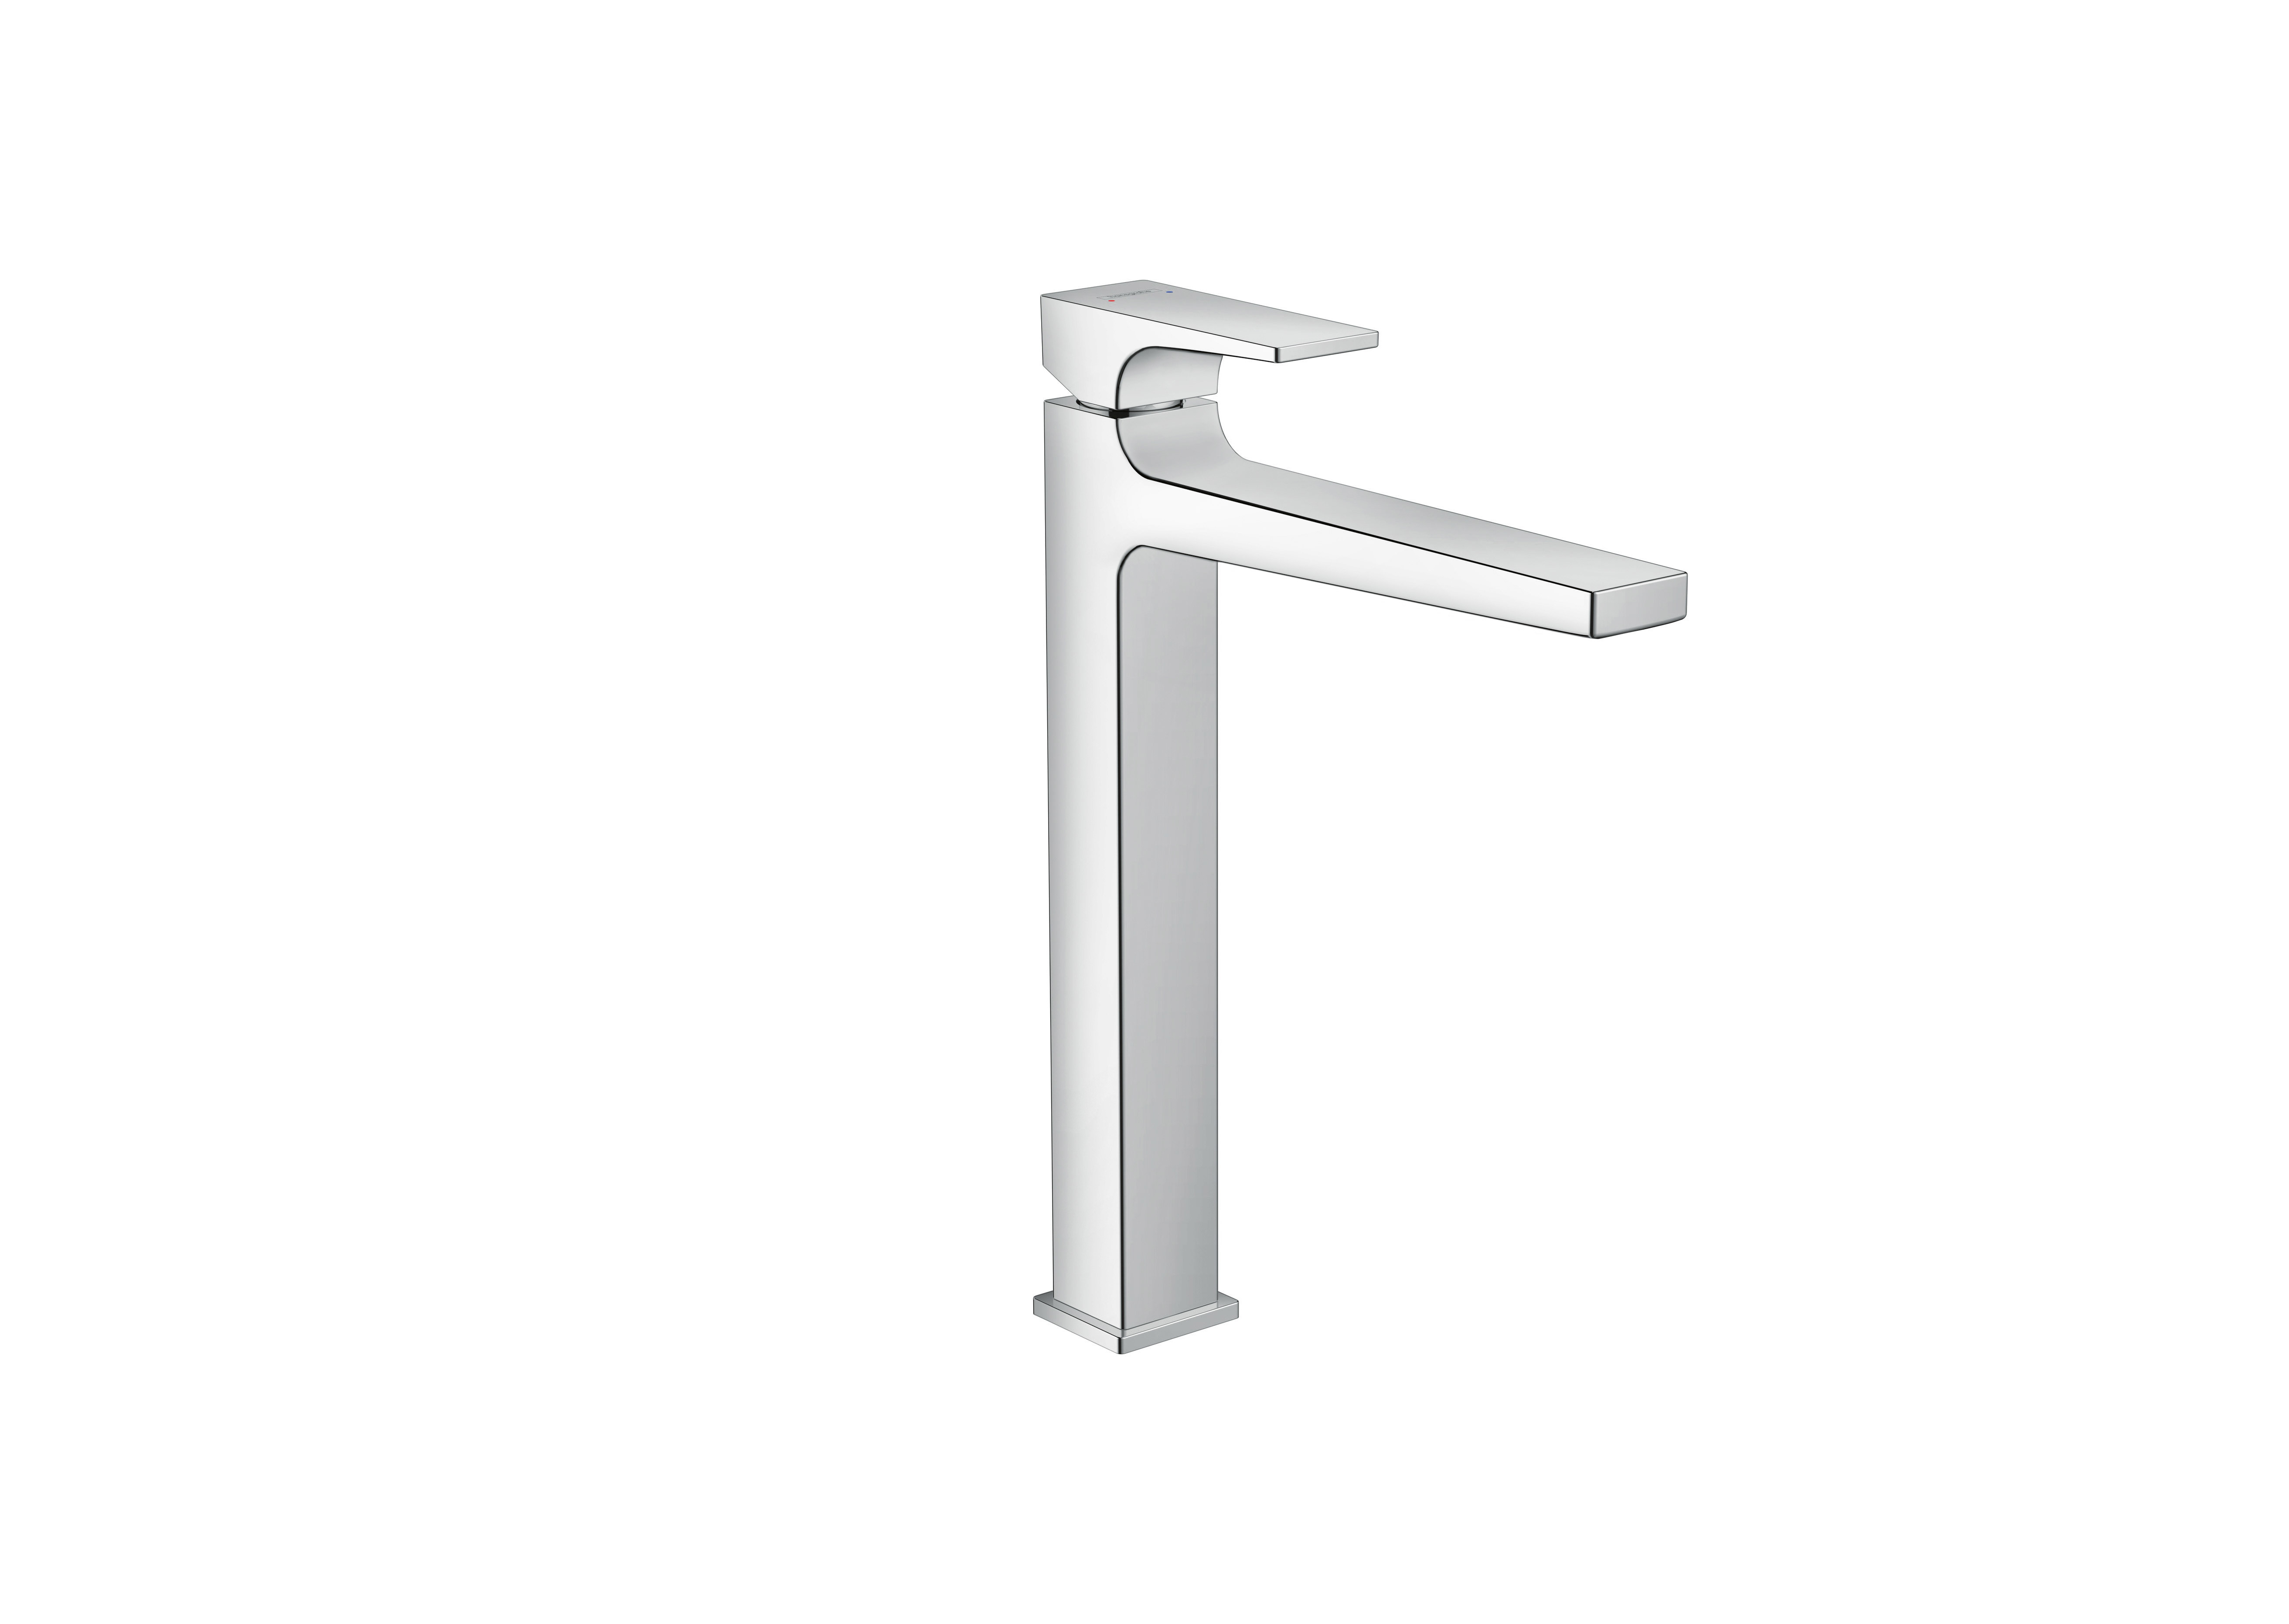 Metropol single lever washbasin mixer 260 by Hansgrohe | STYLEPARK